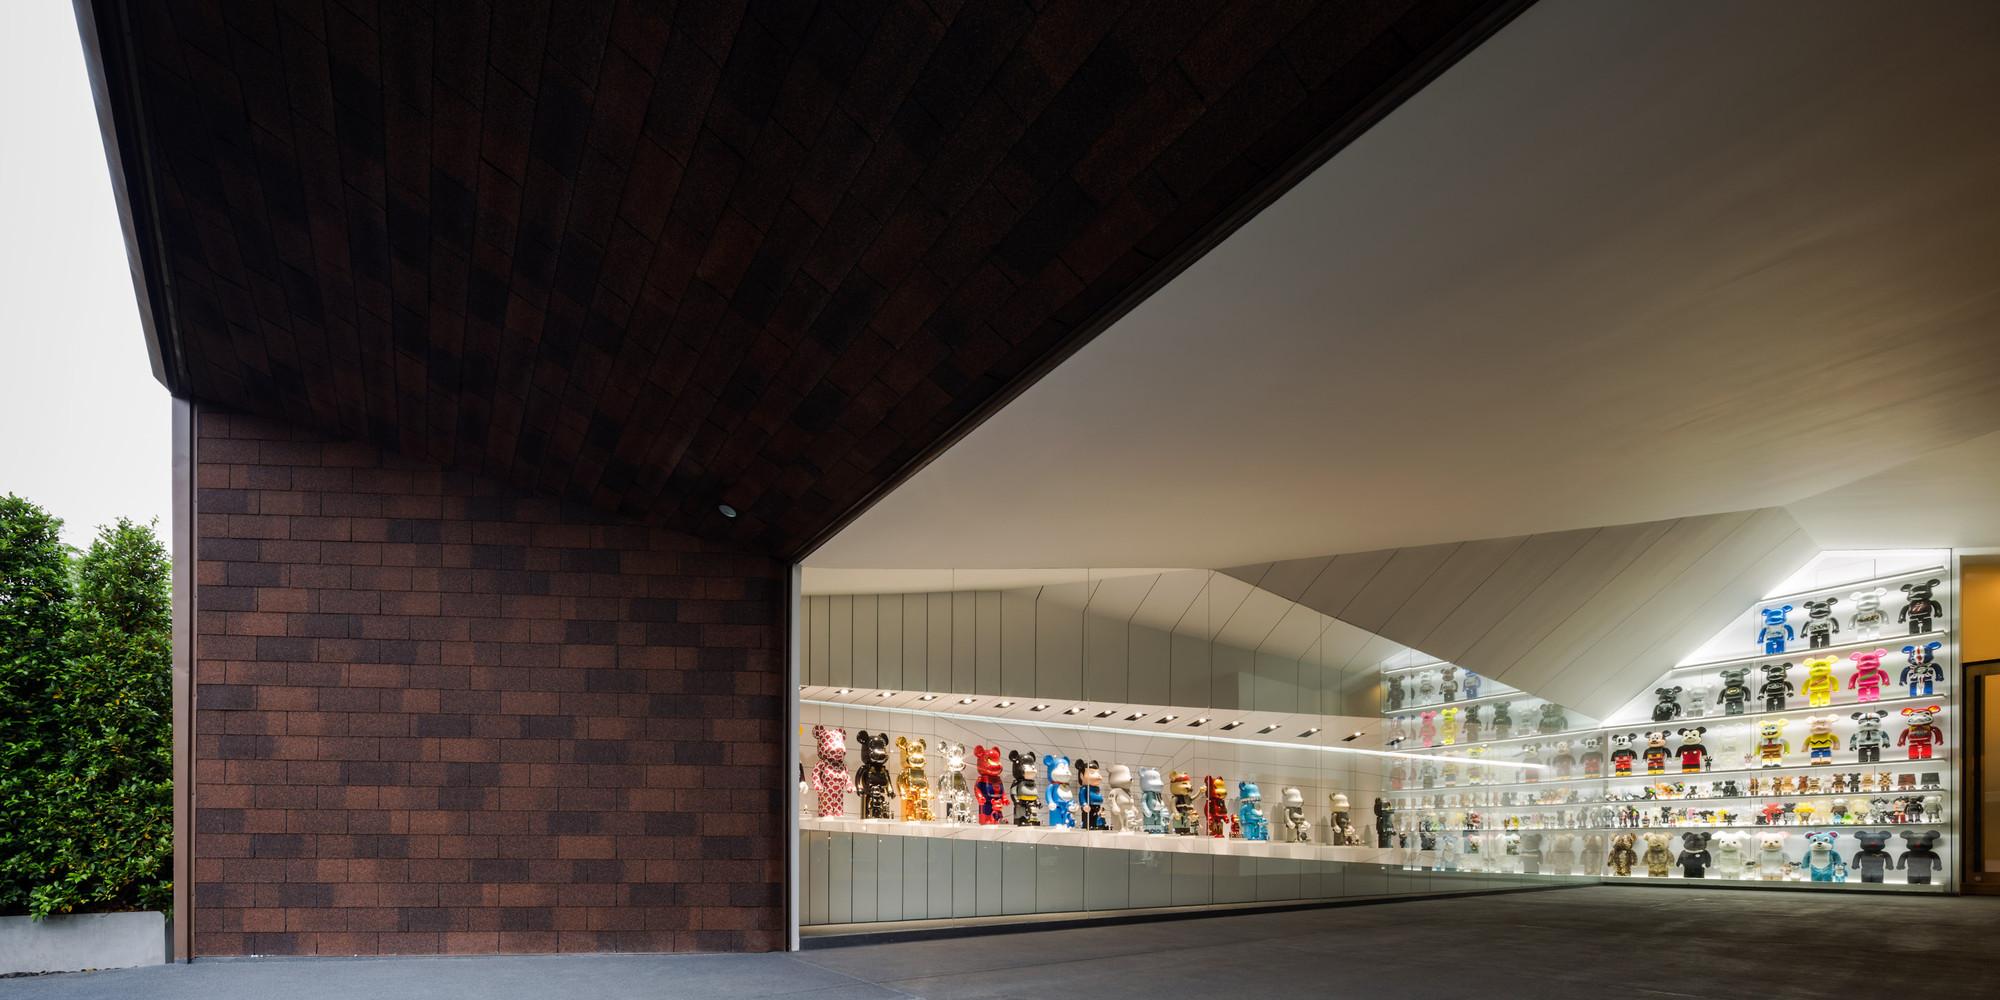 Garaje de los Osos / Openbox Architects, © Wison Tungthanya